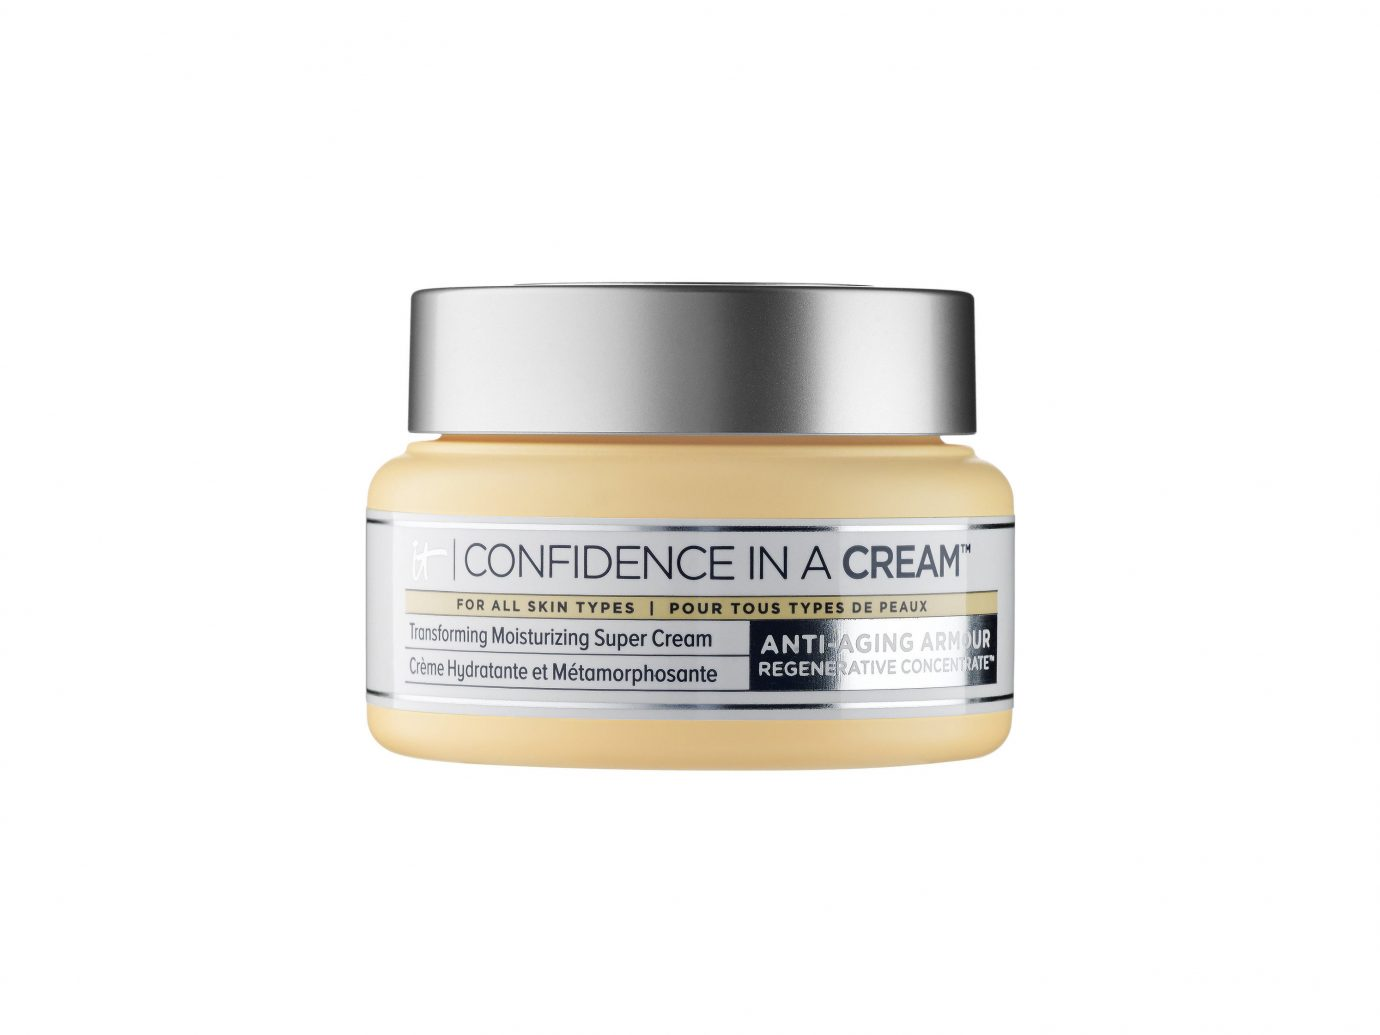 Flights Travel Shop toiletry skin care cream product health & beauty skin cream